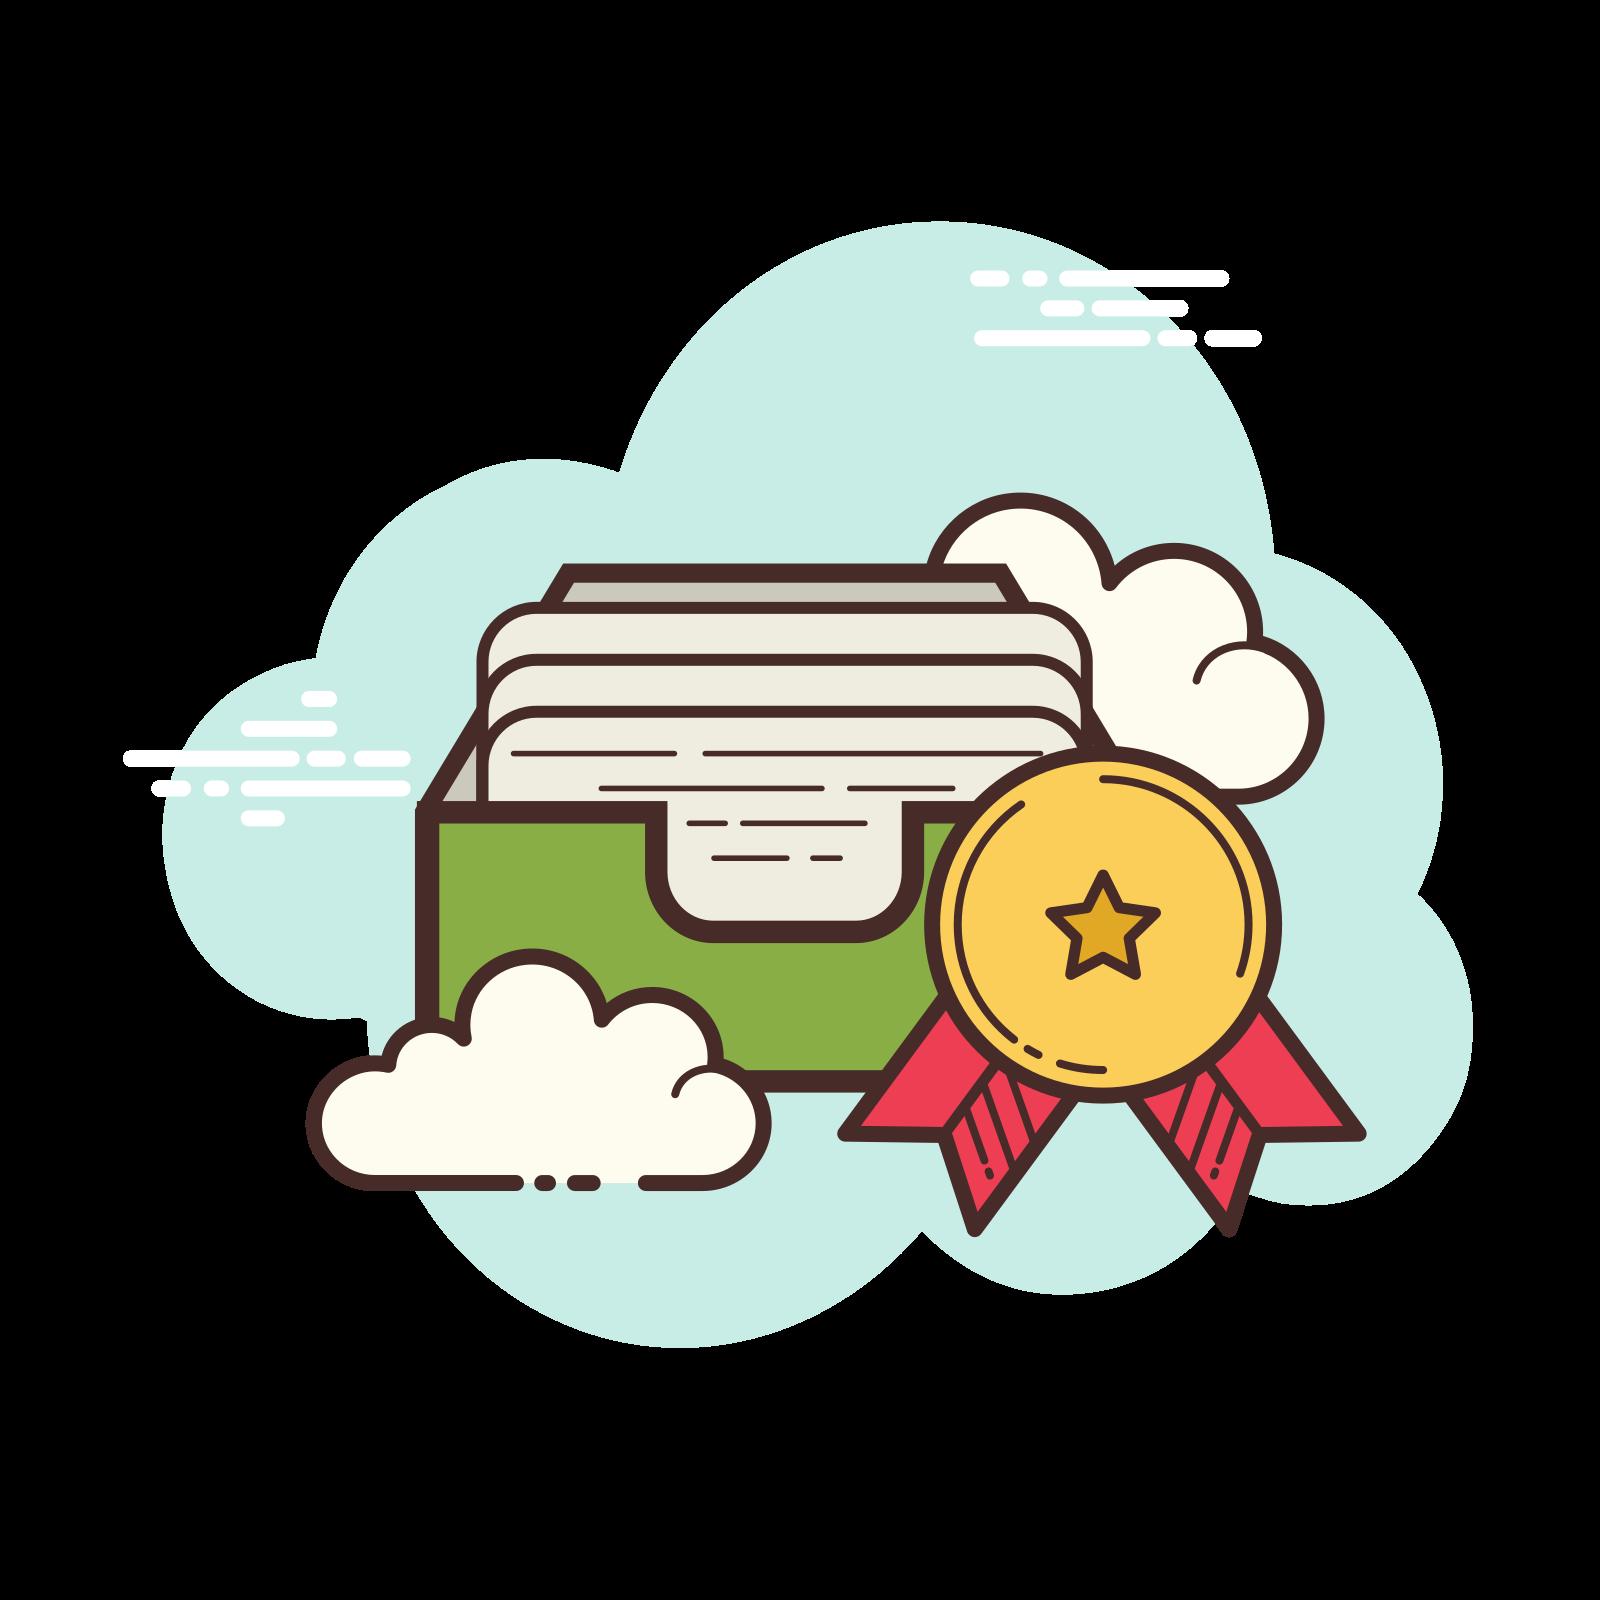 Mailbox Quality icon